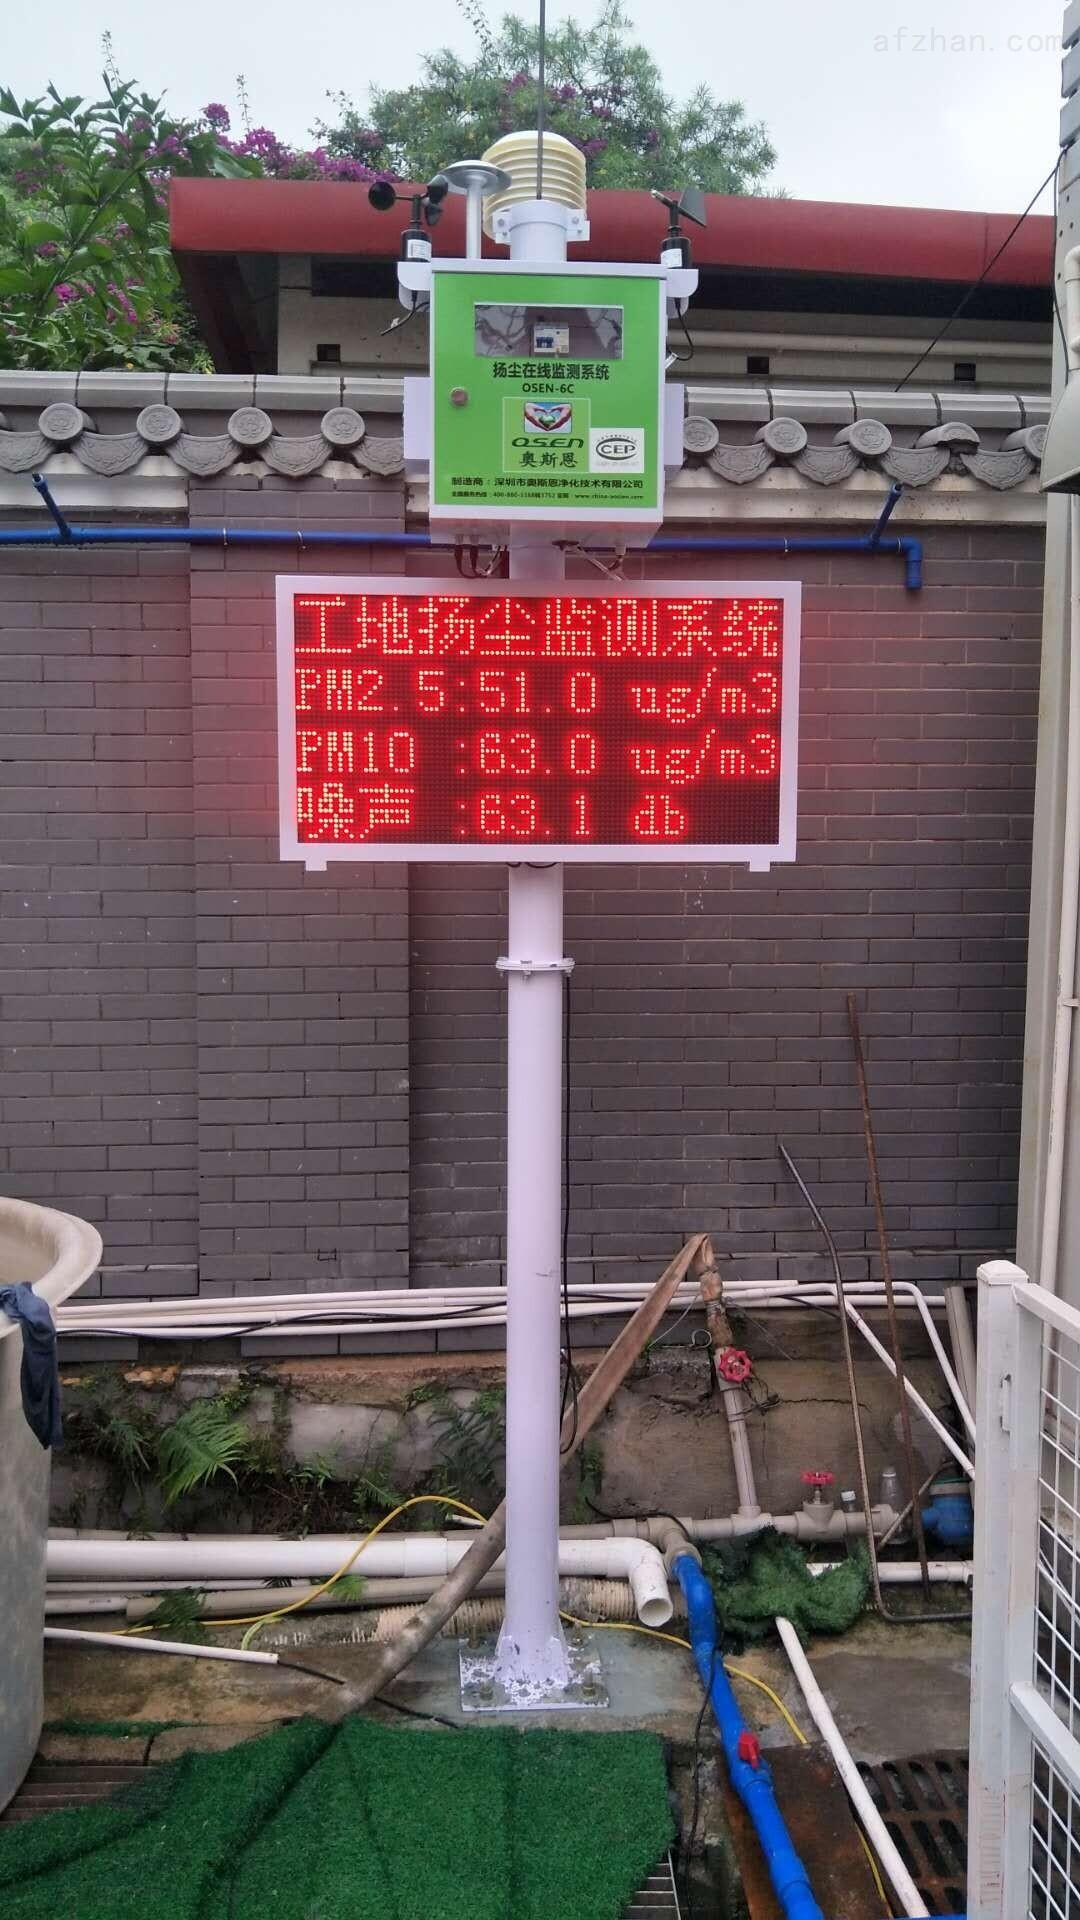 OSEN-6C-宿迁市扬尘浓度环境监控系统